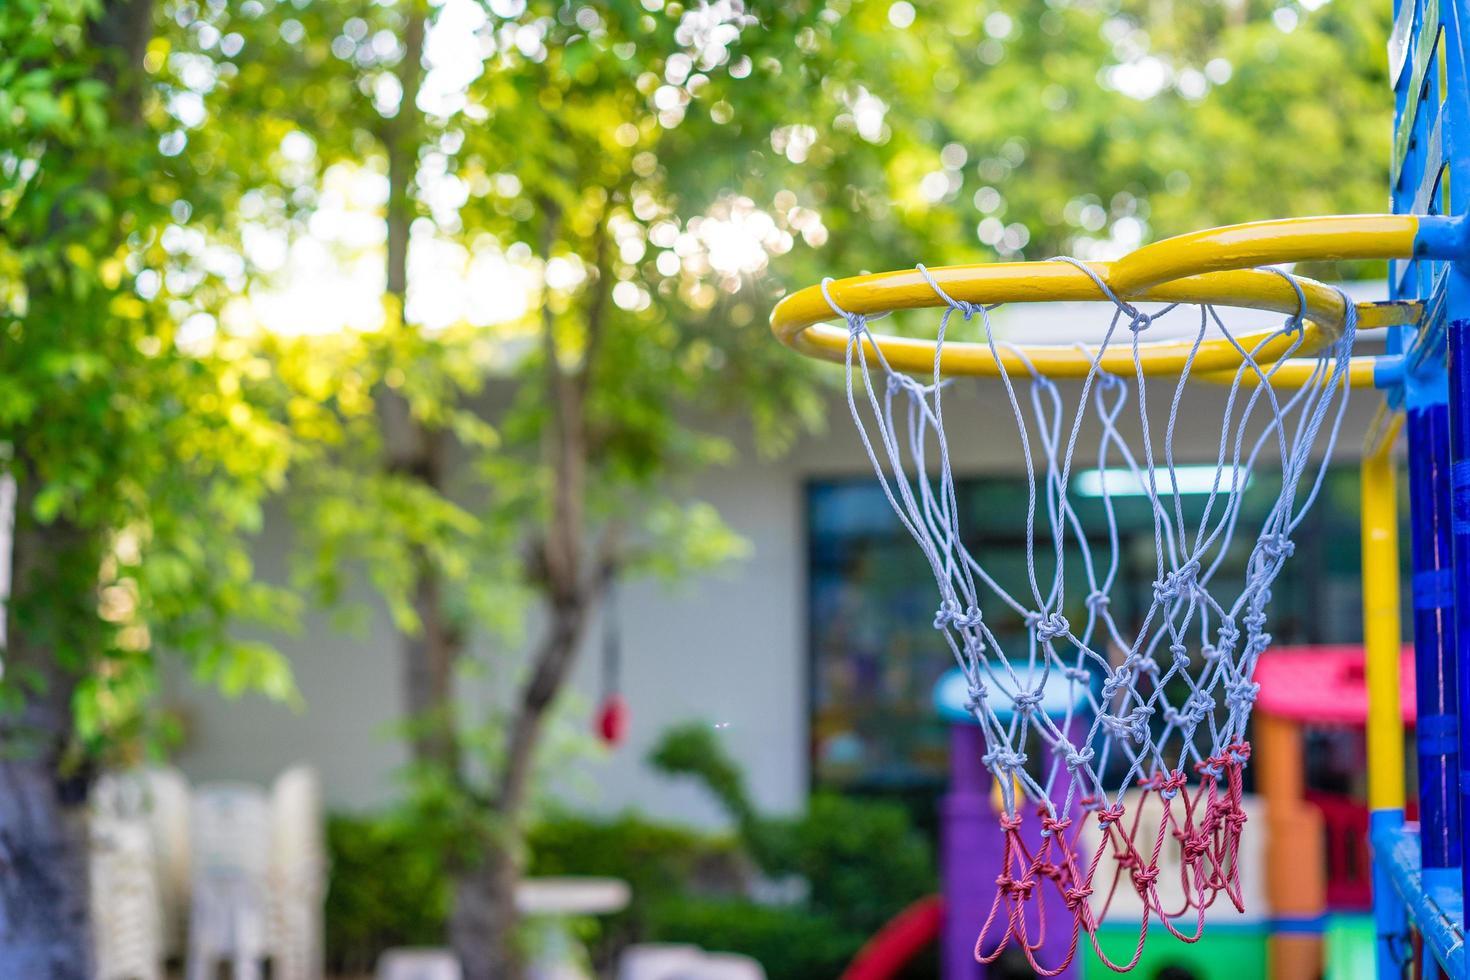 canestro da basket nel parco foto